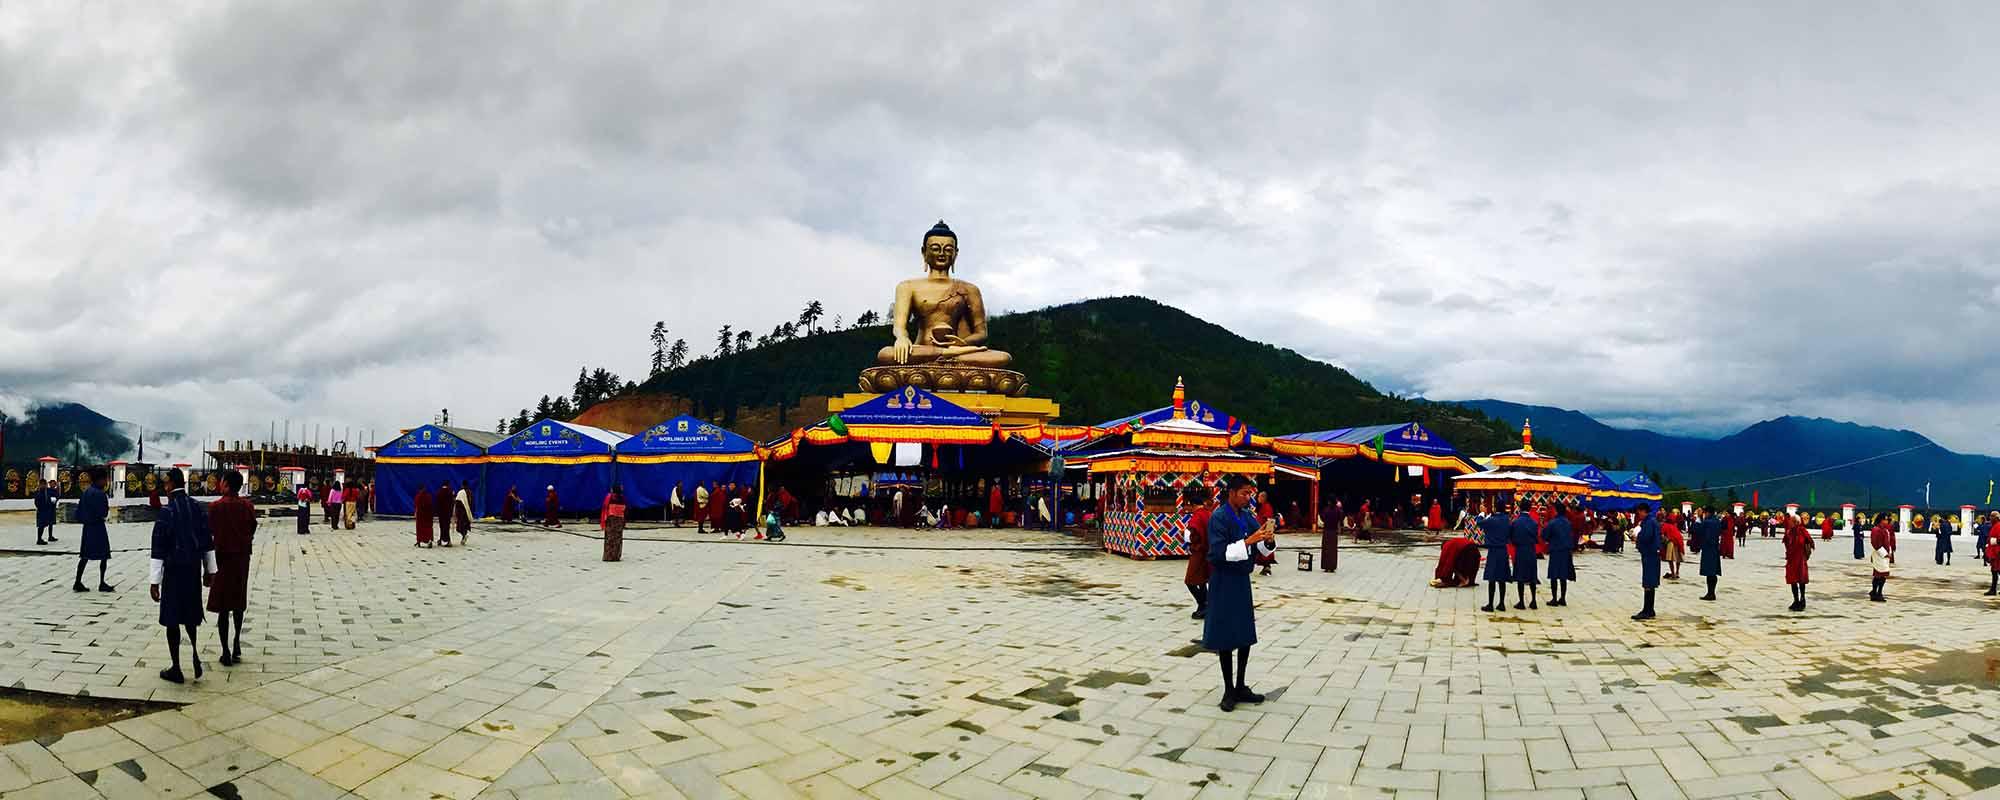 Bhutan Dreamy Destination